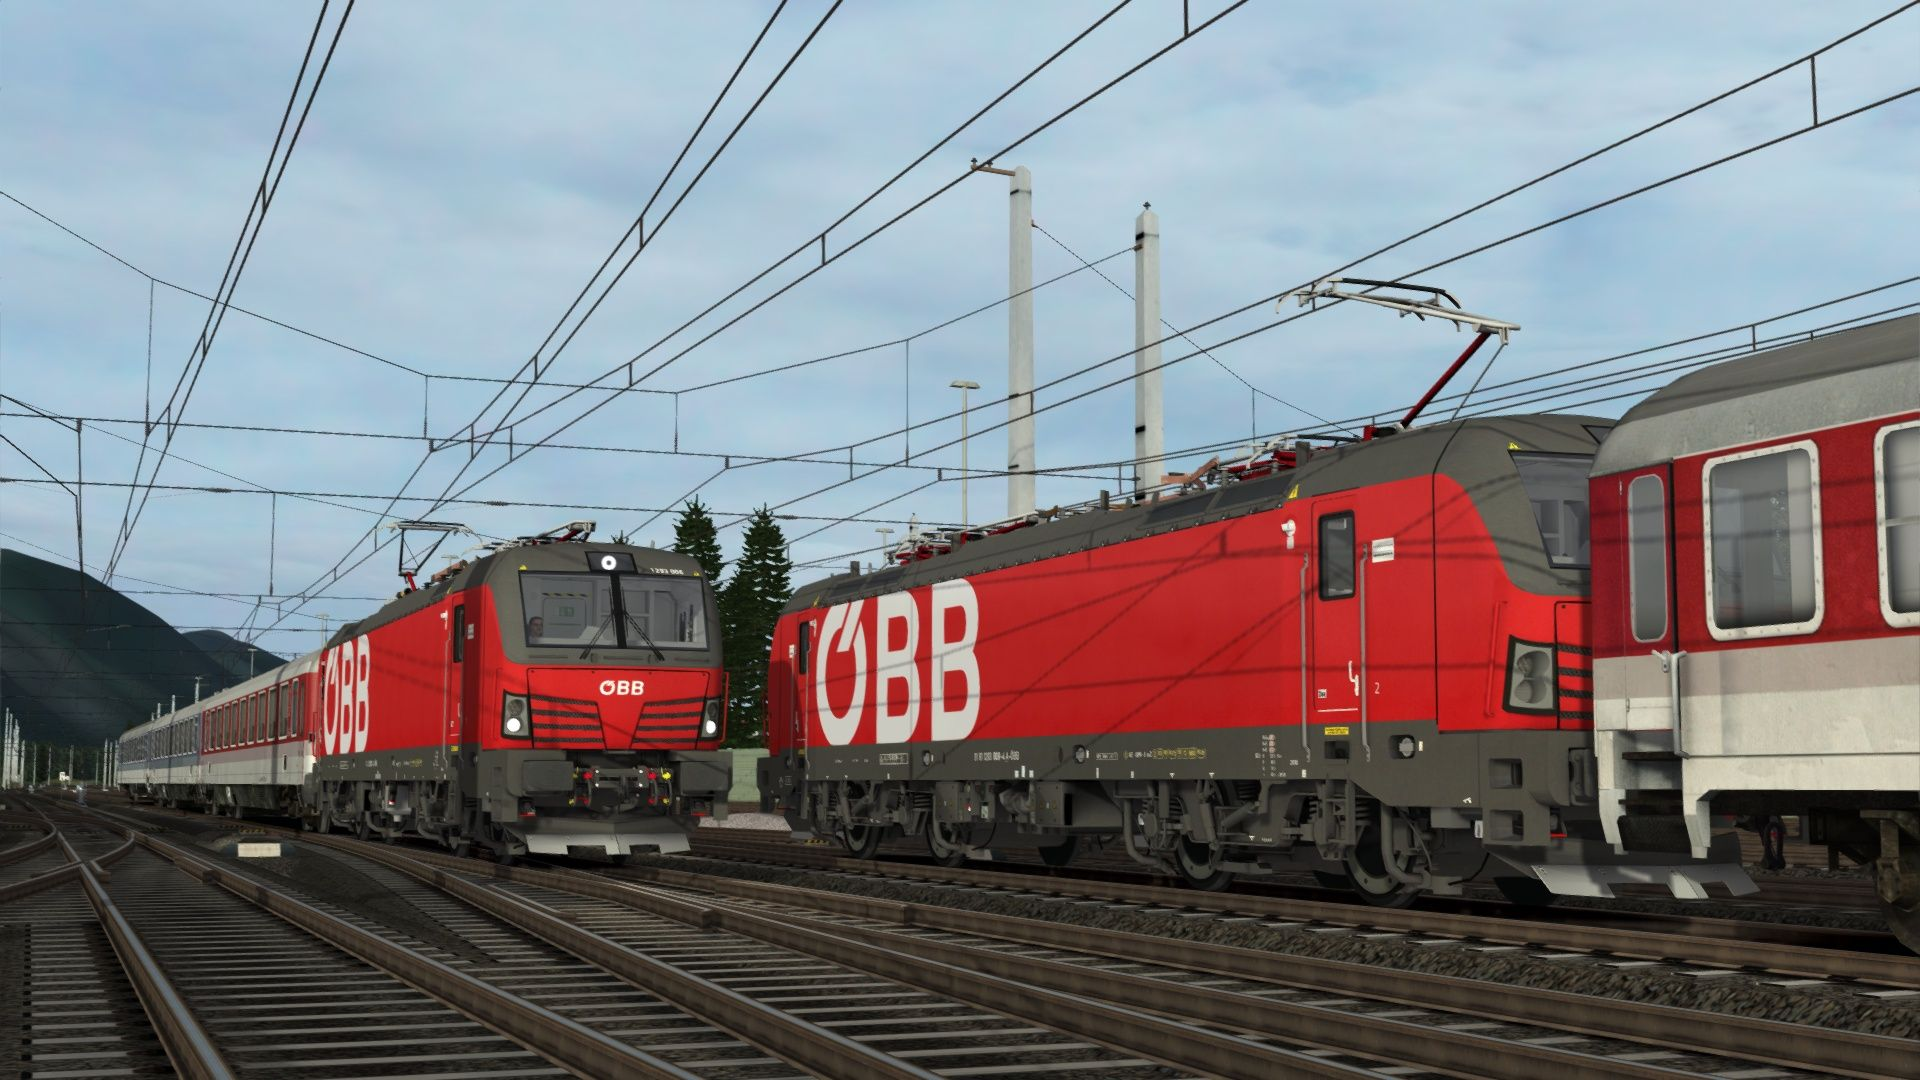 OBB12931